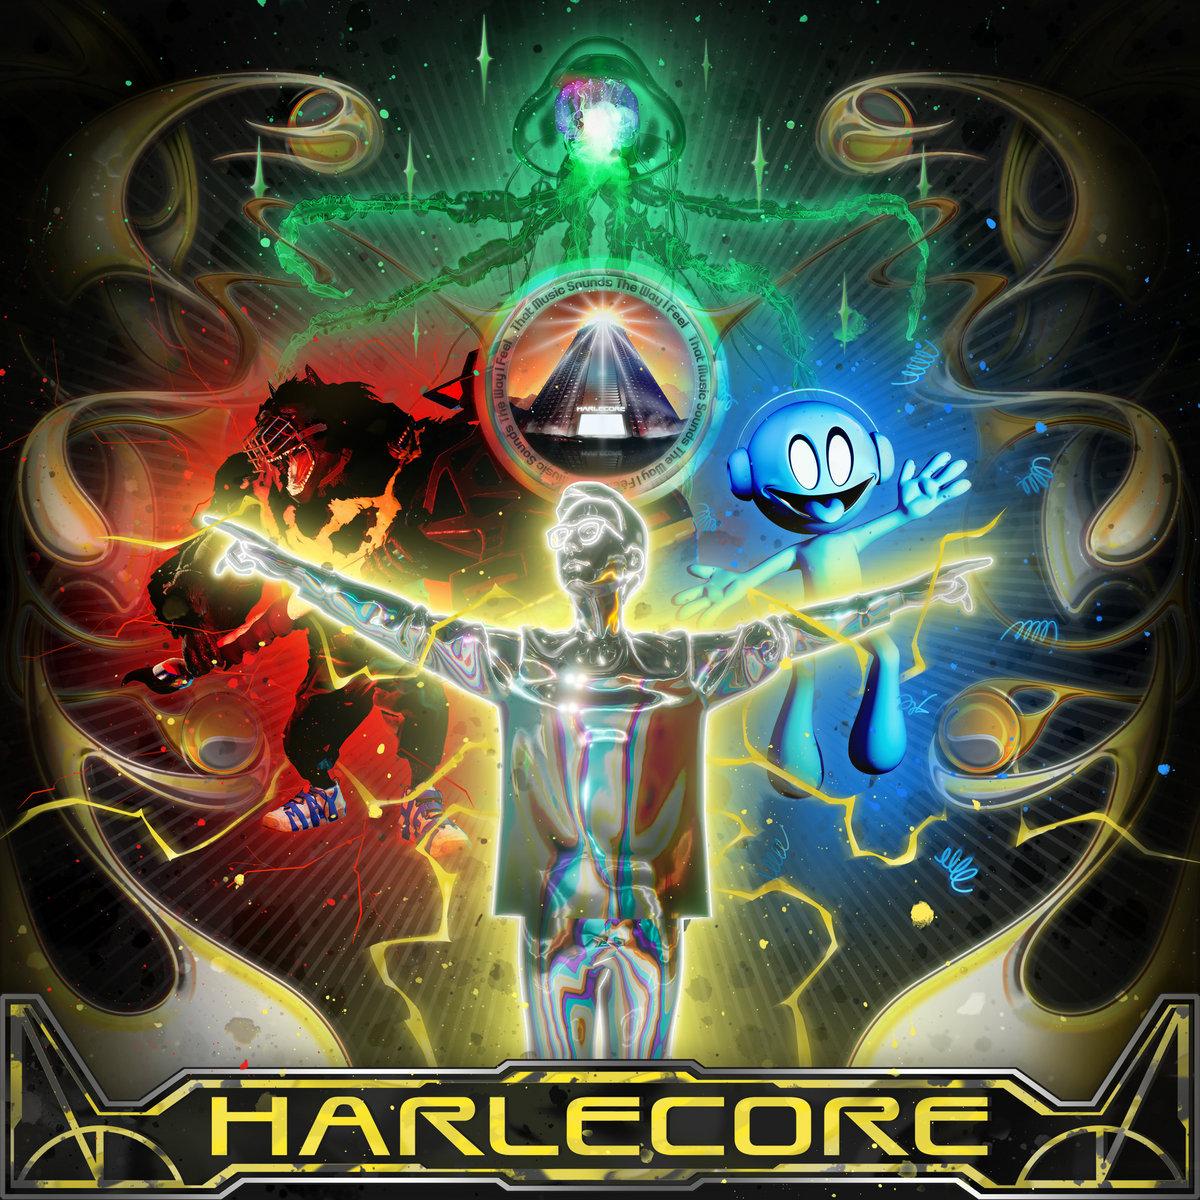 Danny L Harle - Harlecore